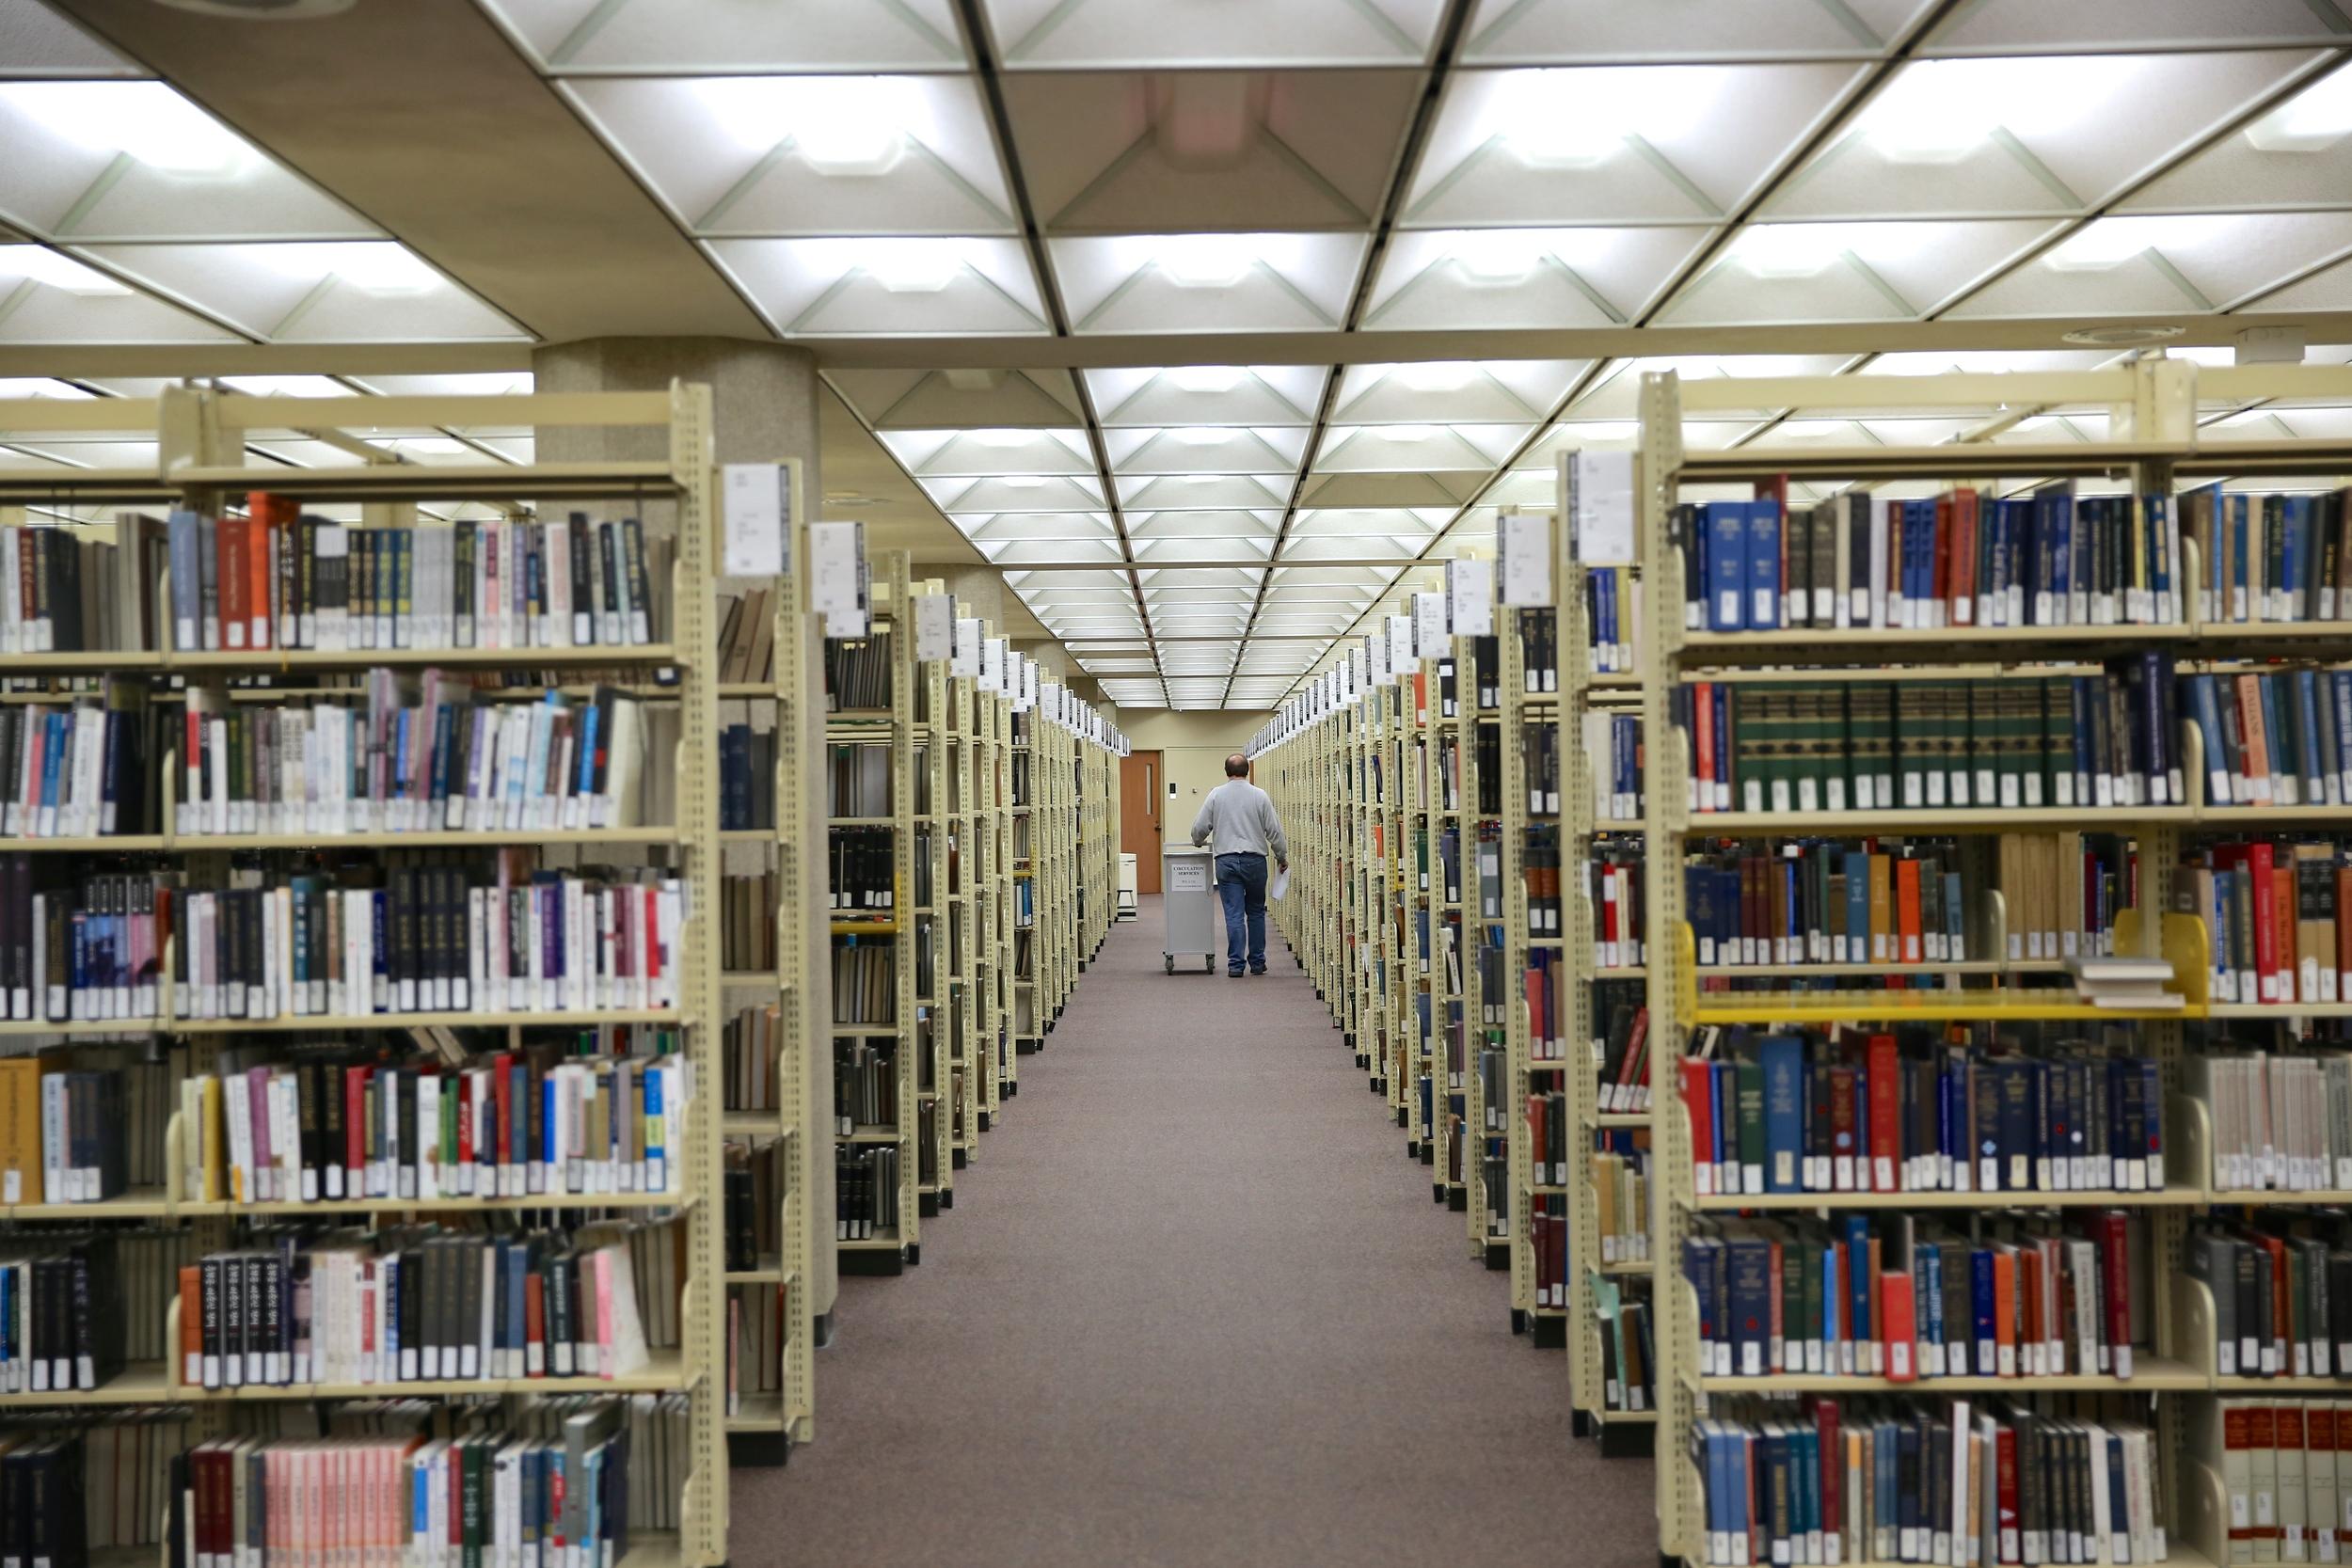 Custard in search of more books